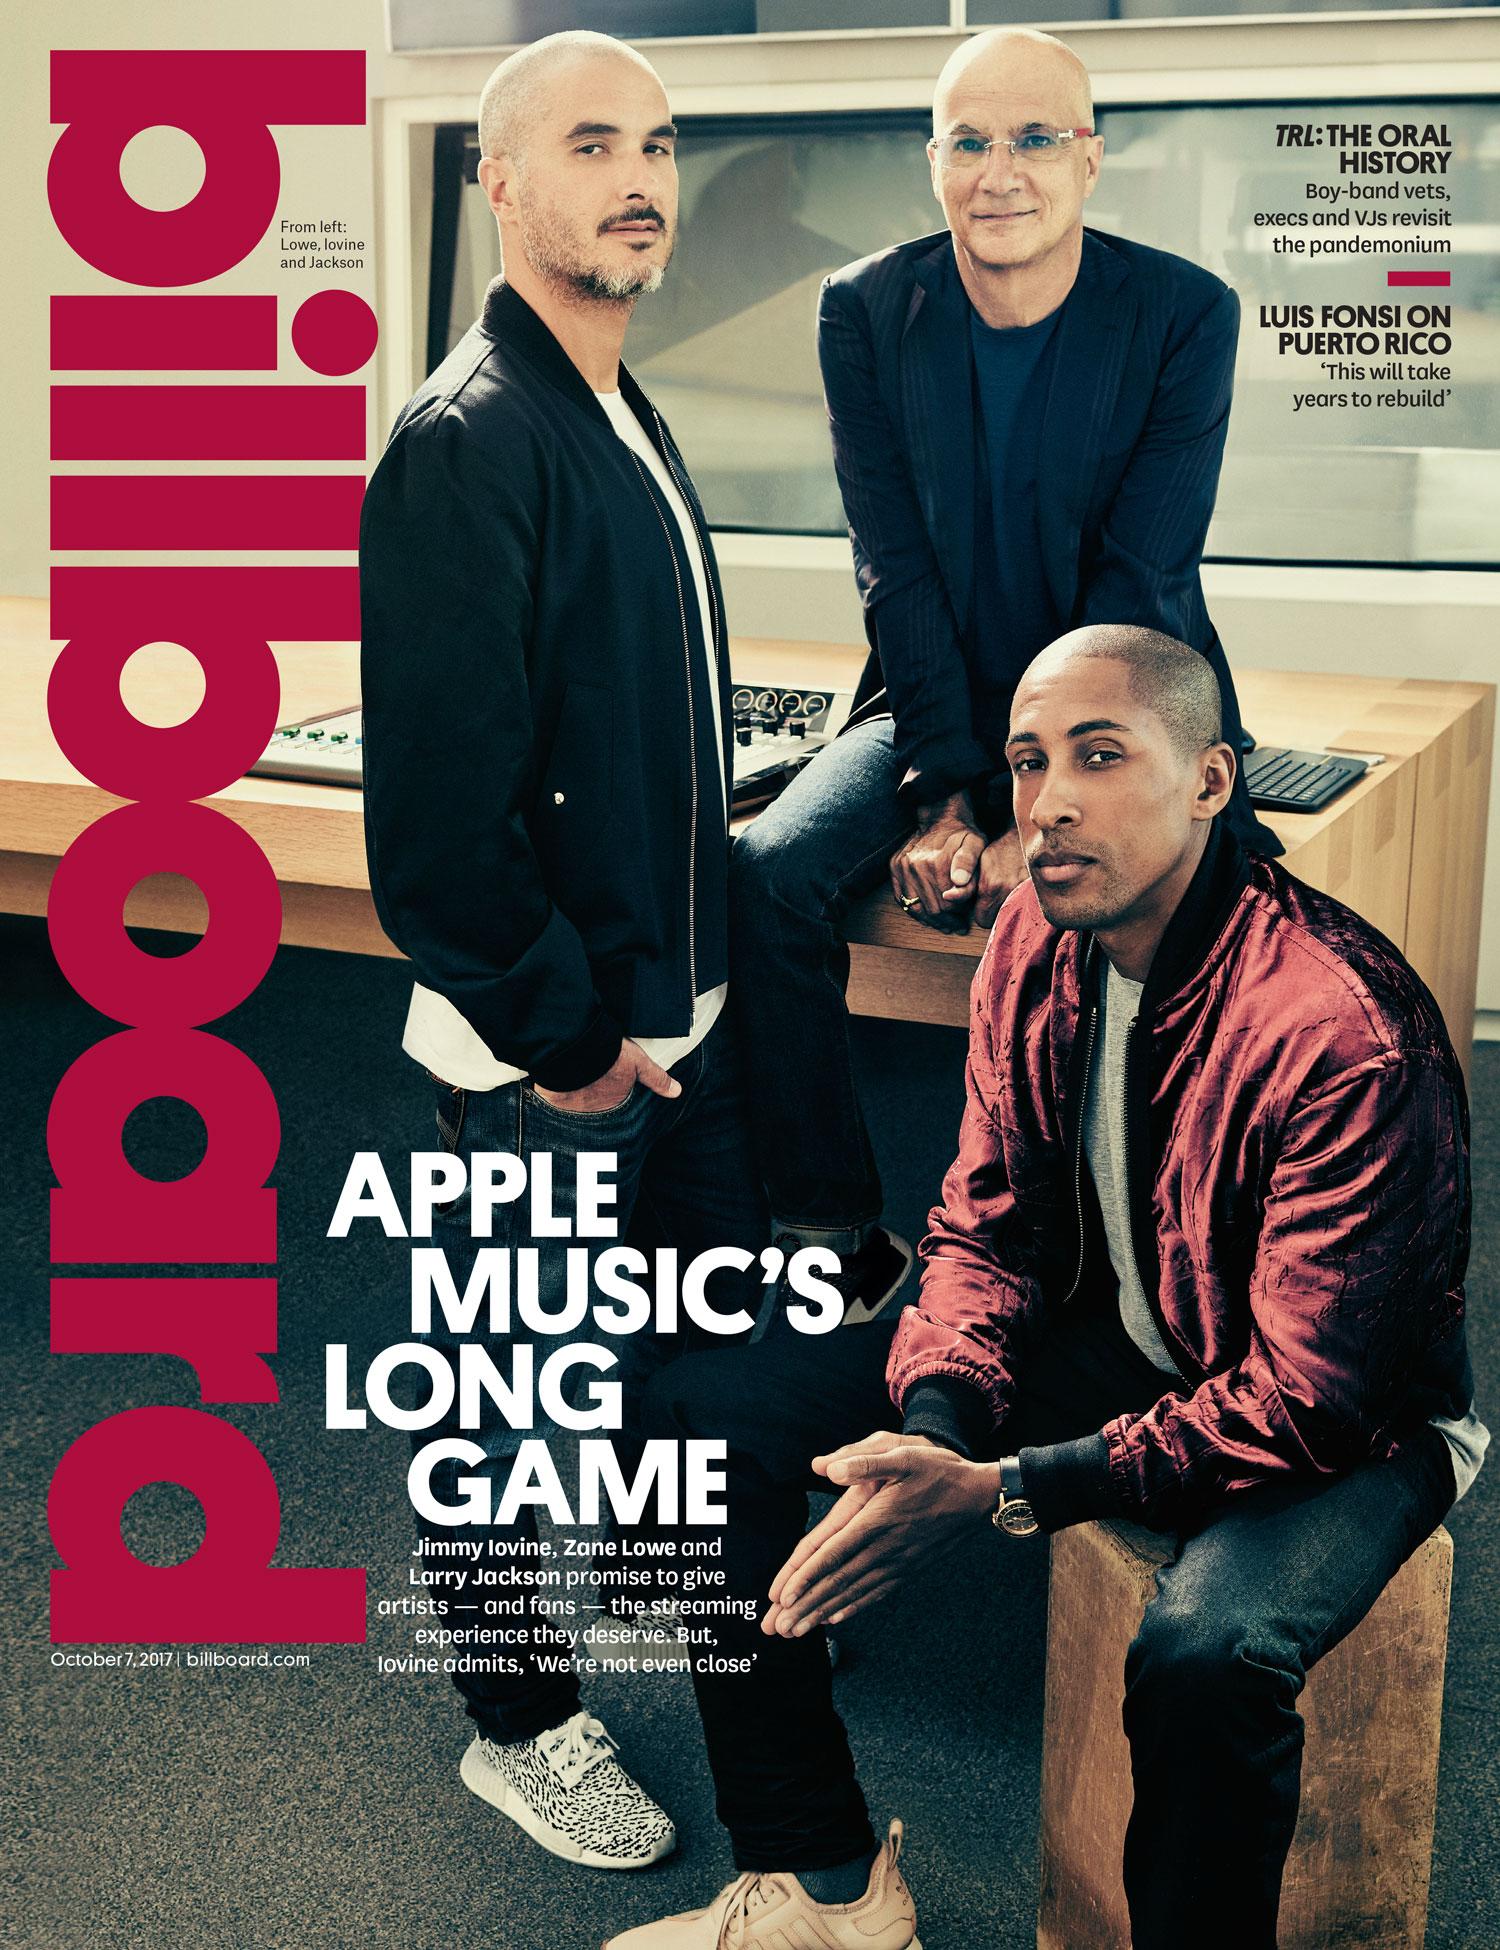 Capa da Billboard com os chefes do Apple Music